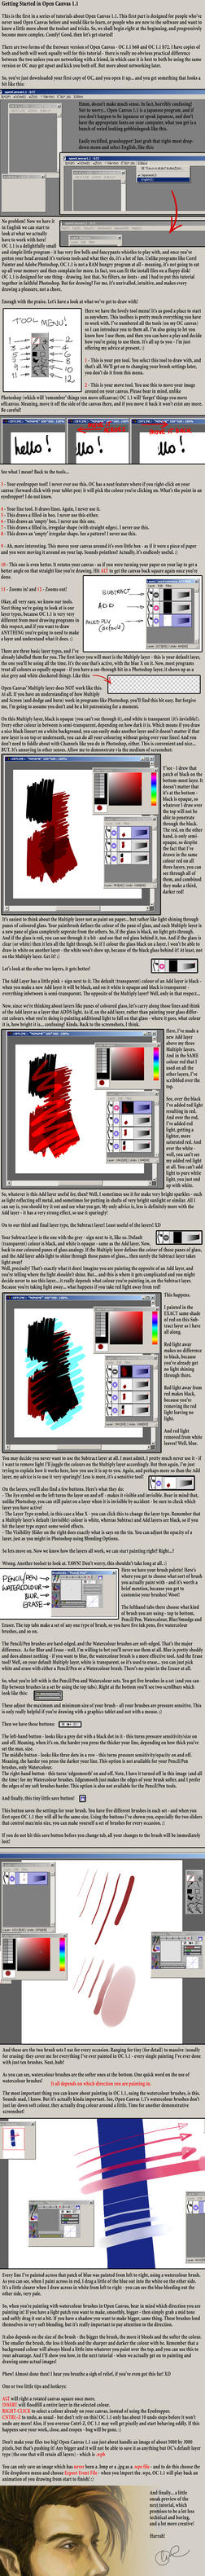 Open Canvas Tutorial, part 1 by pixieface